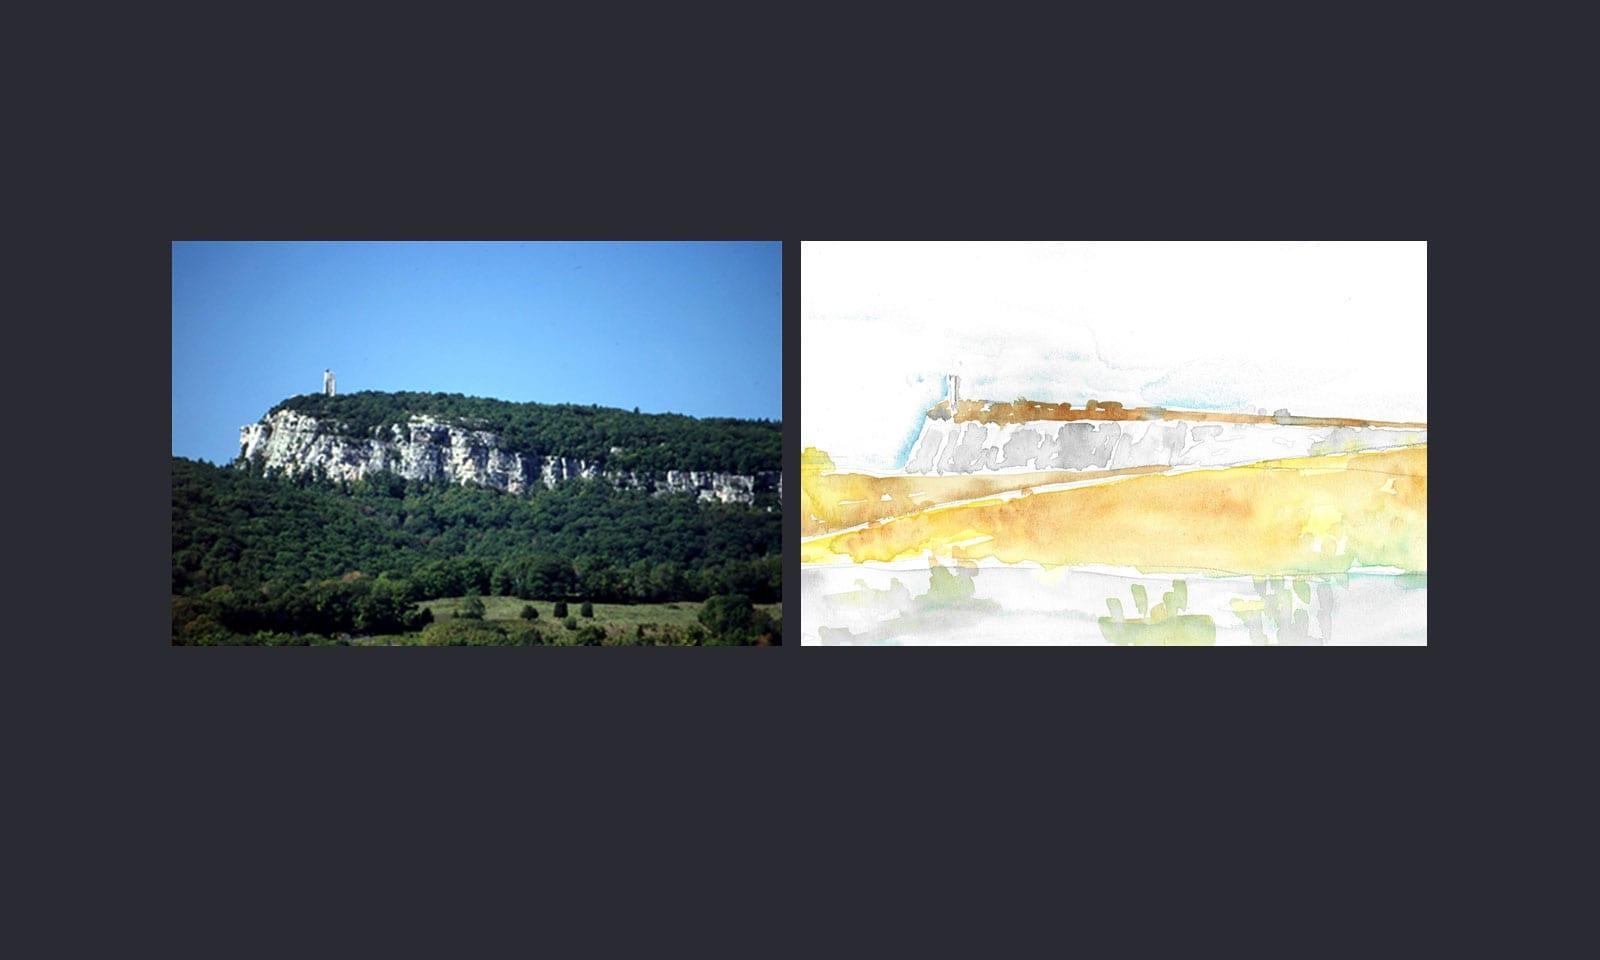 Photograph of the Shawangunk palisade alongside painting by ikon.5 architects